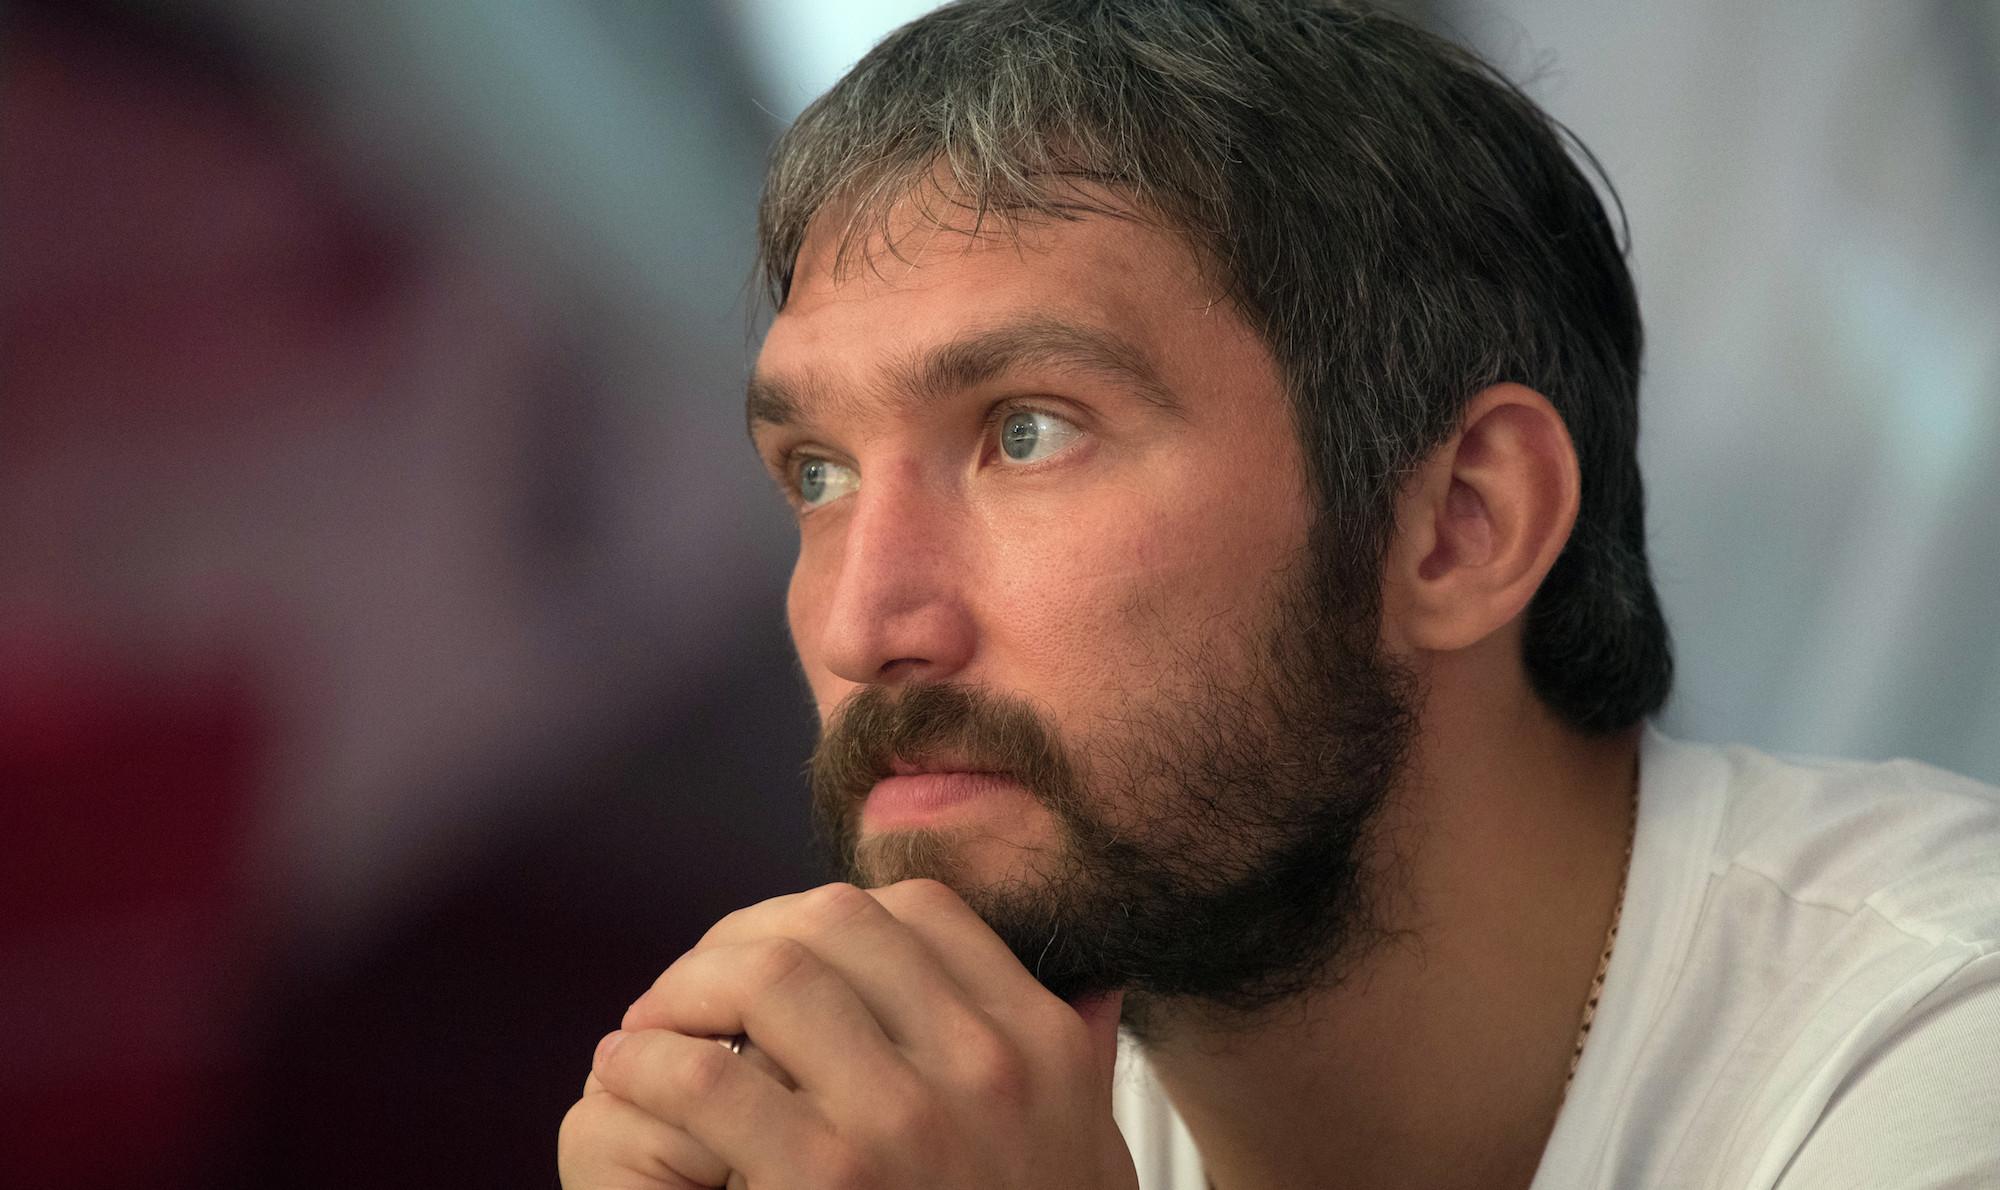 <p>Александр Овечкин. Фото: &copy; РИА Новости/Сергей Гунеев</p>